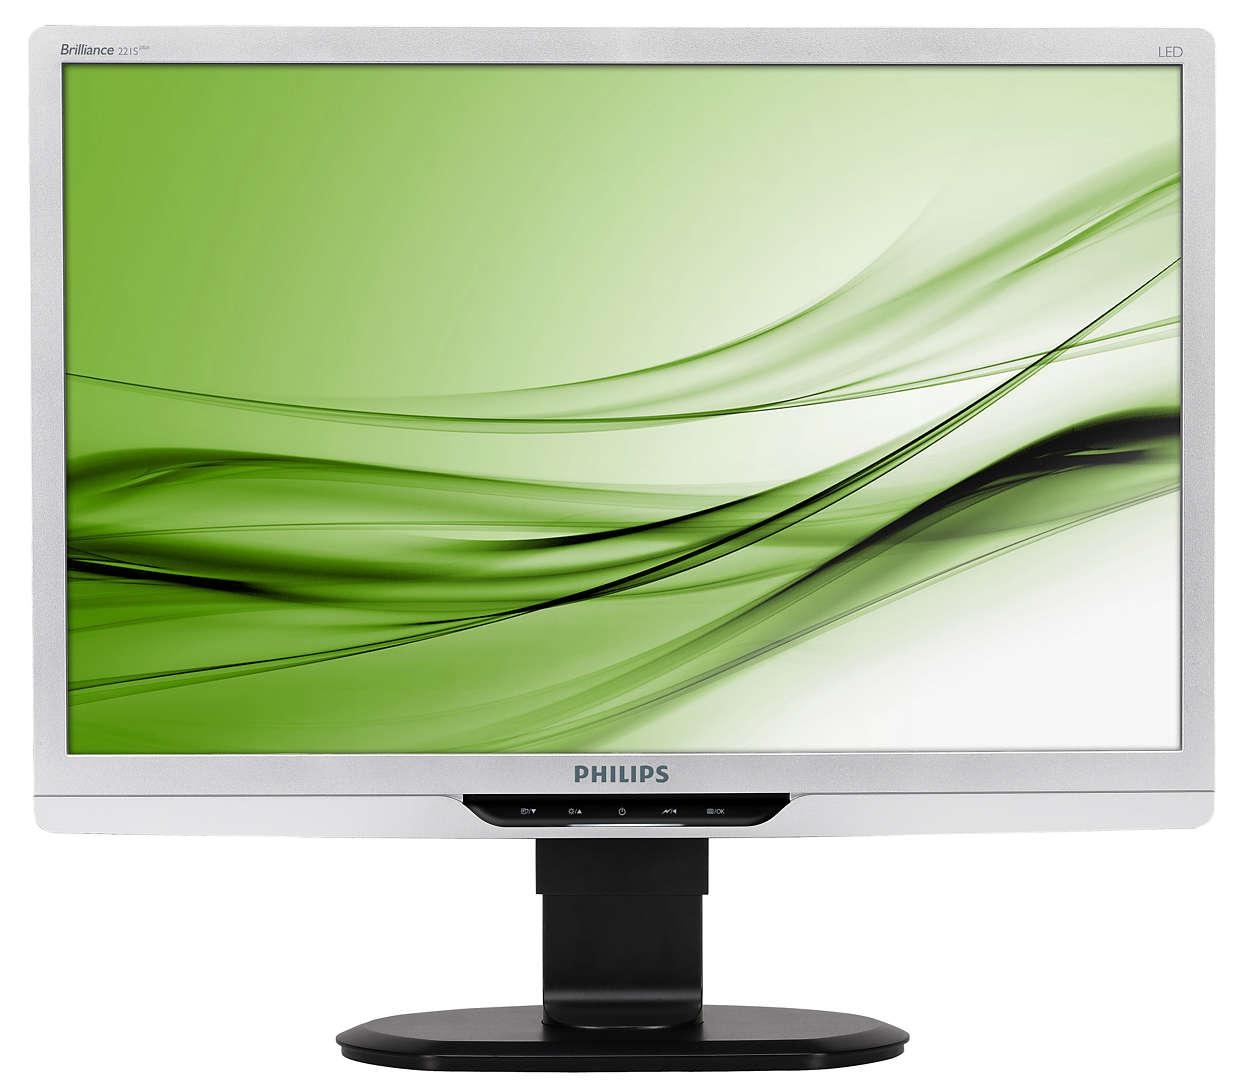 Ergonomisk LED-skærm øger produktiviteten